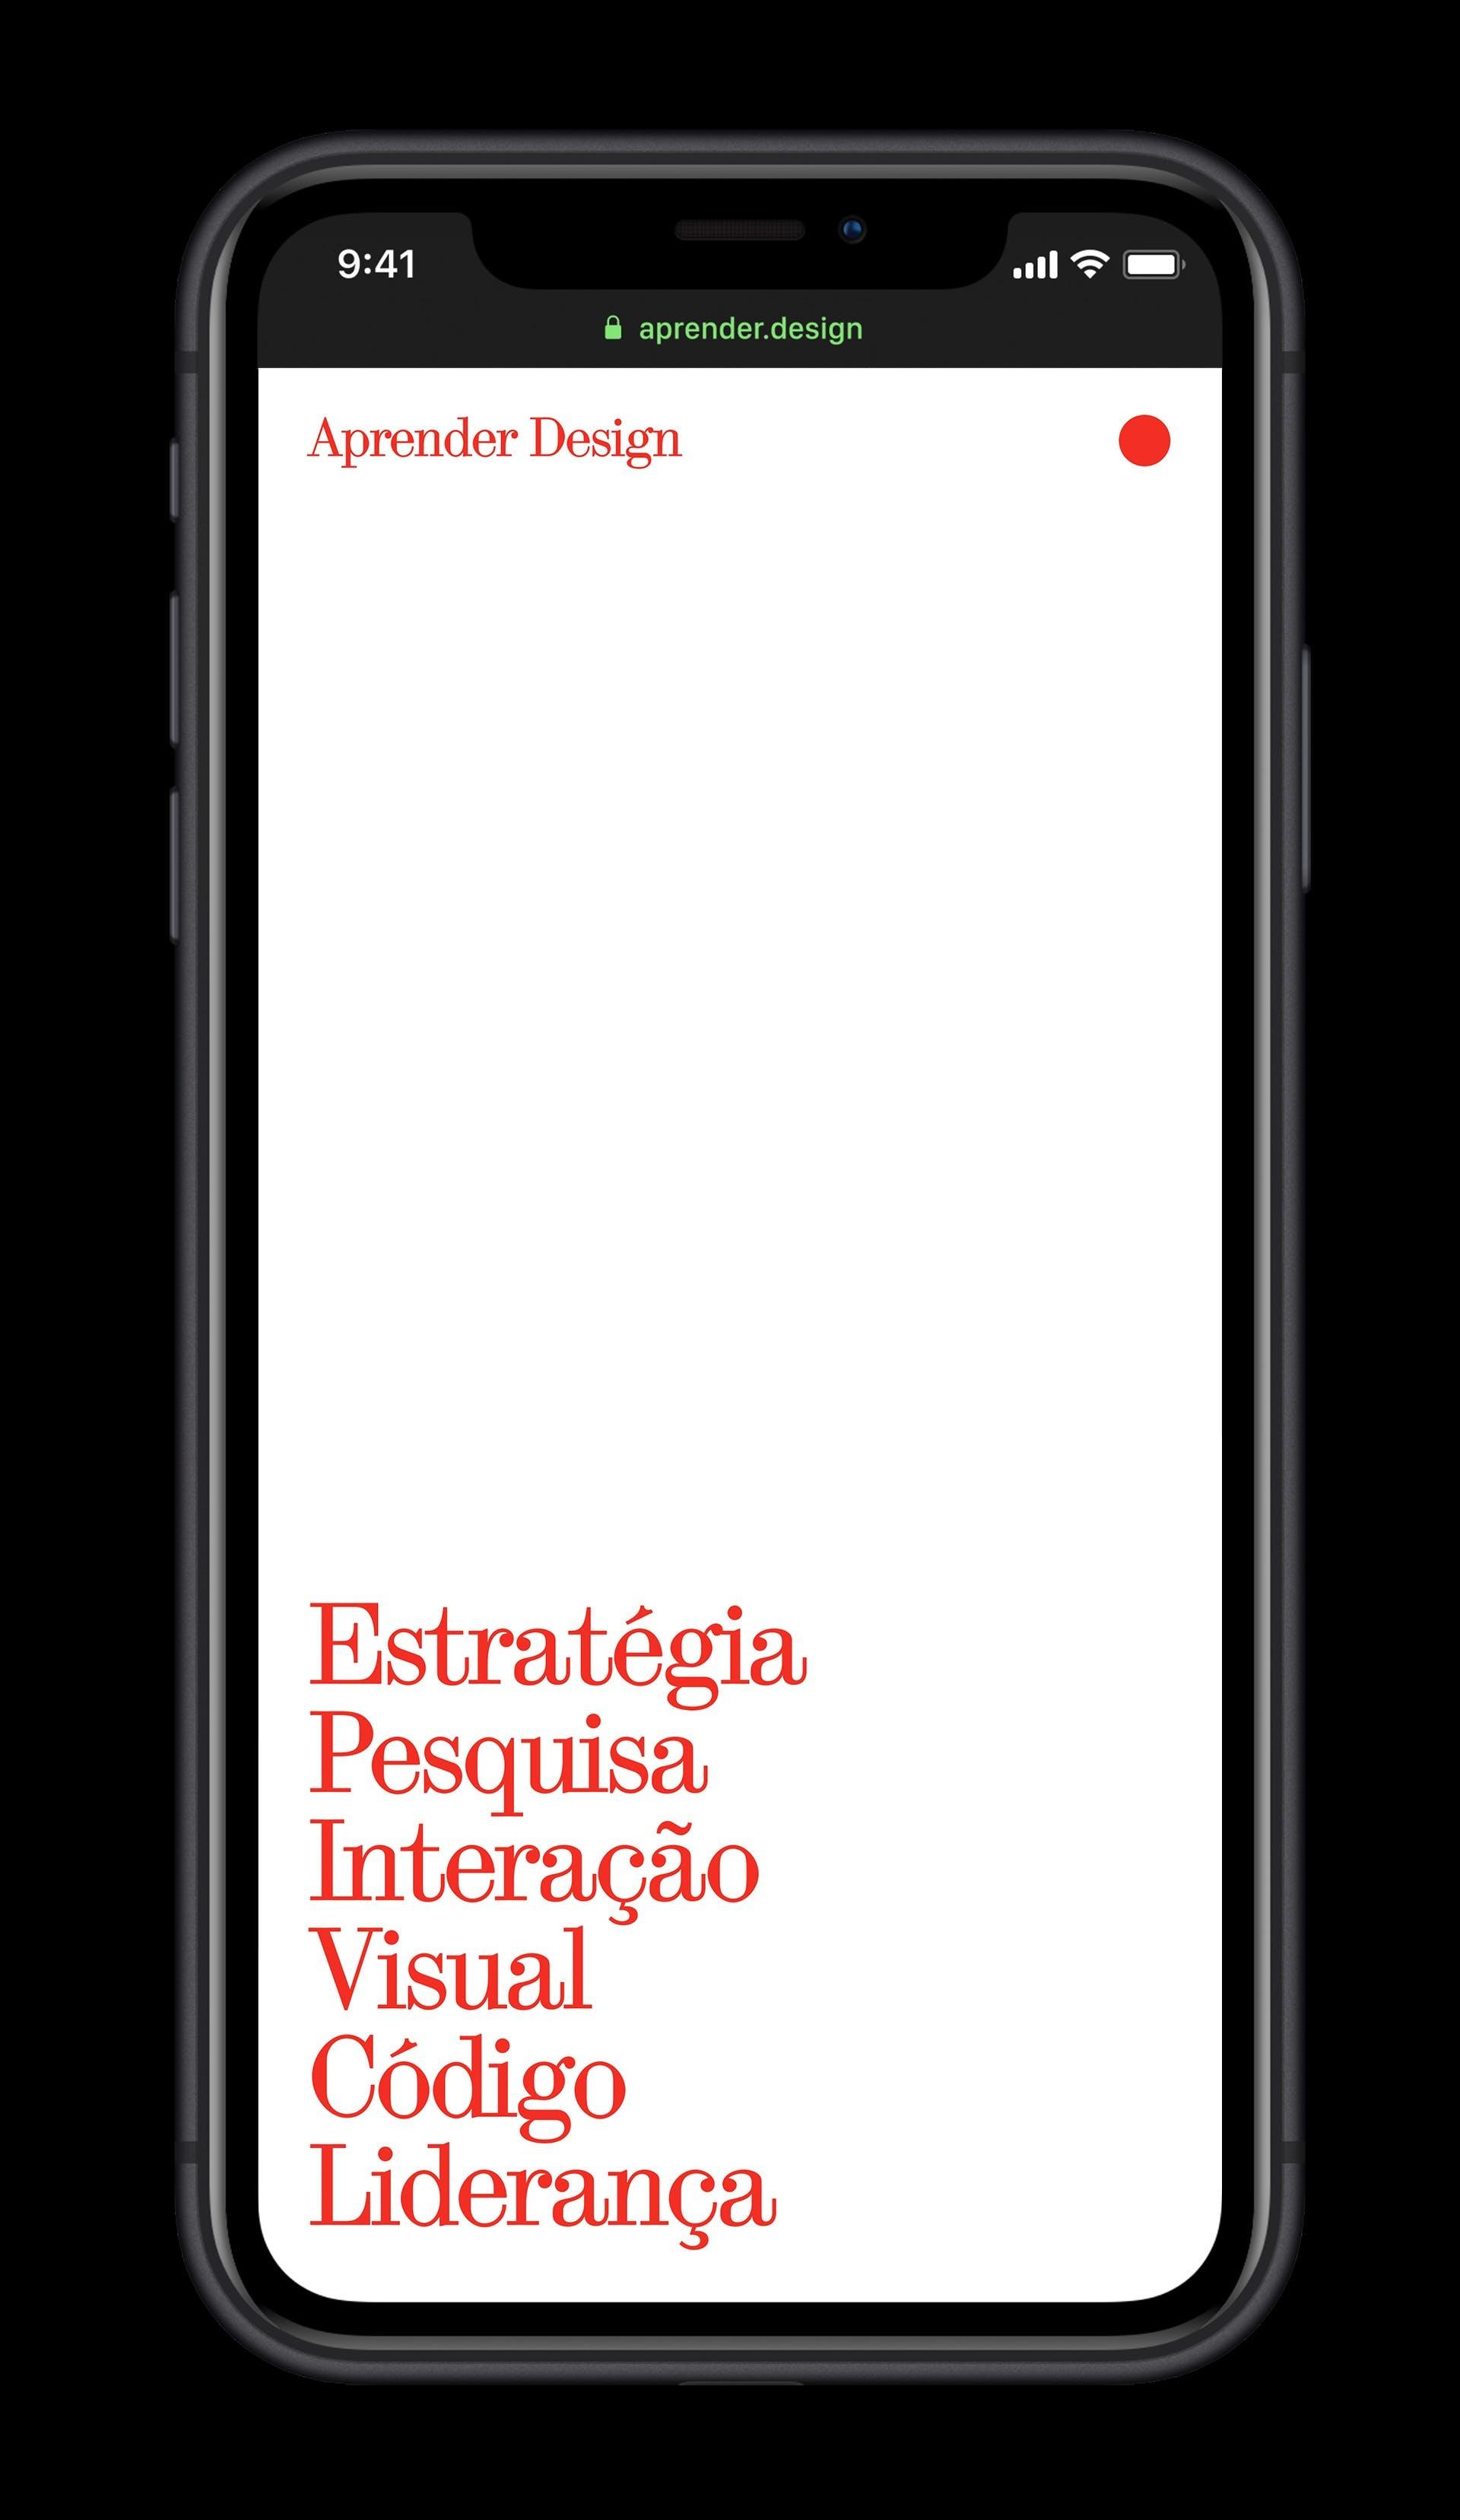 glauber-sampaio-aprender-design-15.jpeg